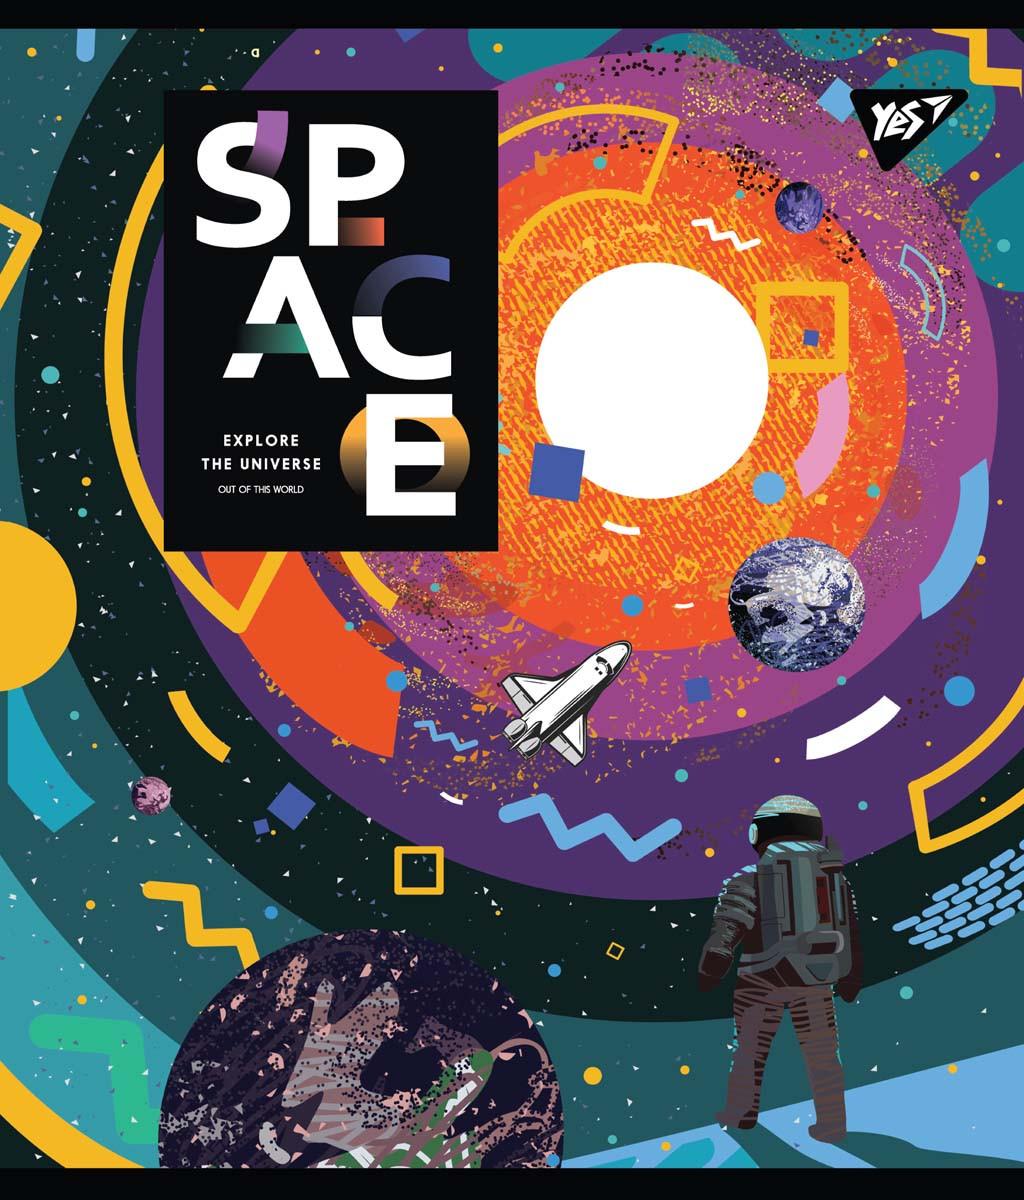 Зошит А5 18 Лін. YES Space Abstract, 10 шт/уп.